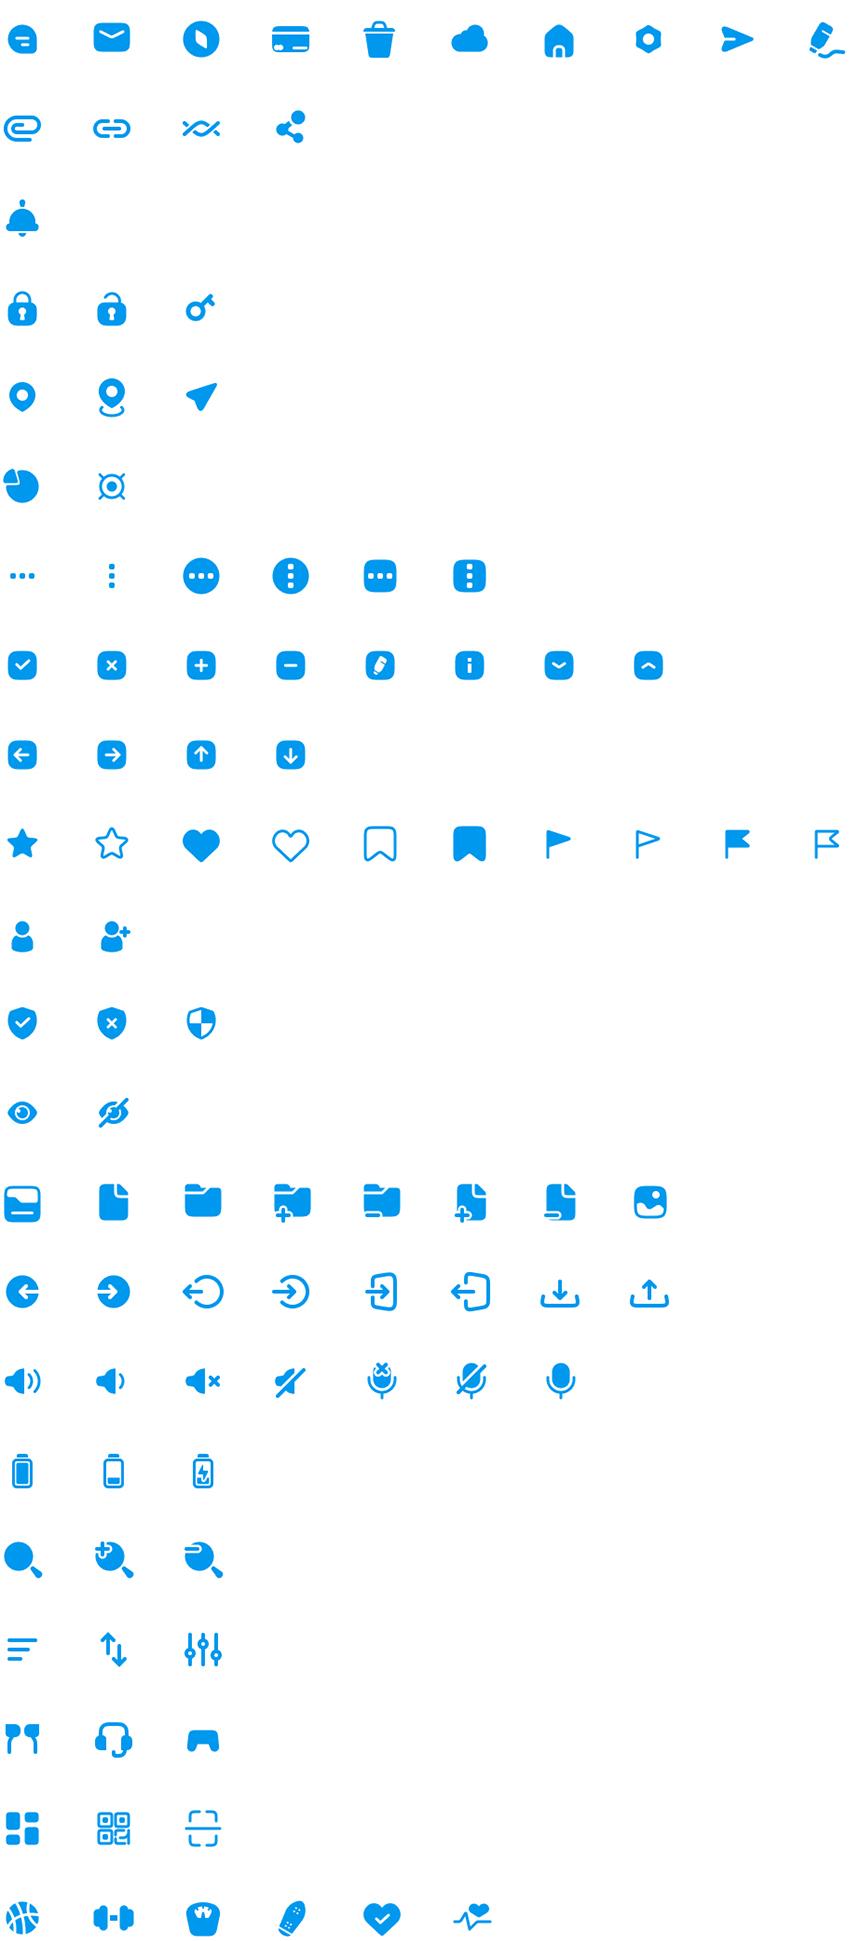 Free 100 Multipurpose Icons figma free download